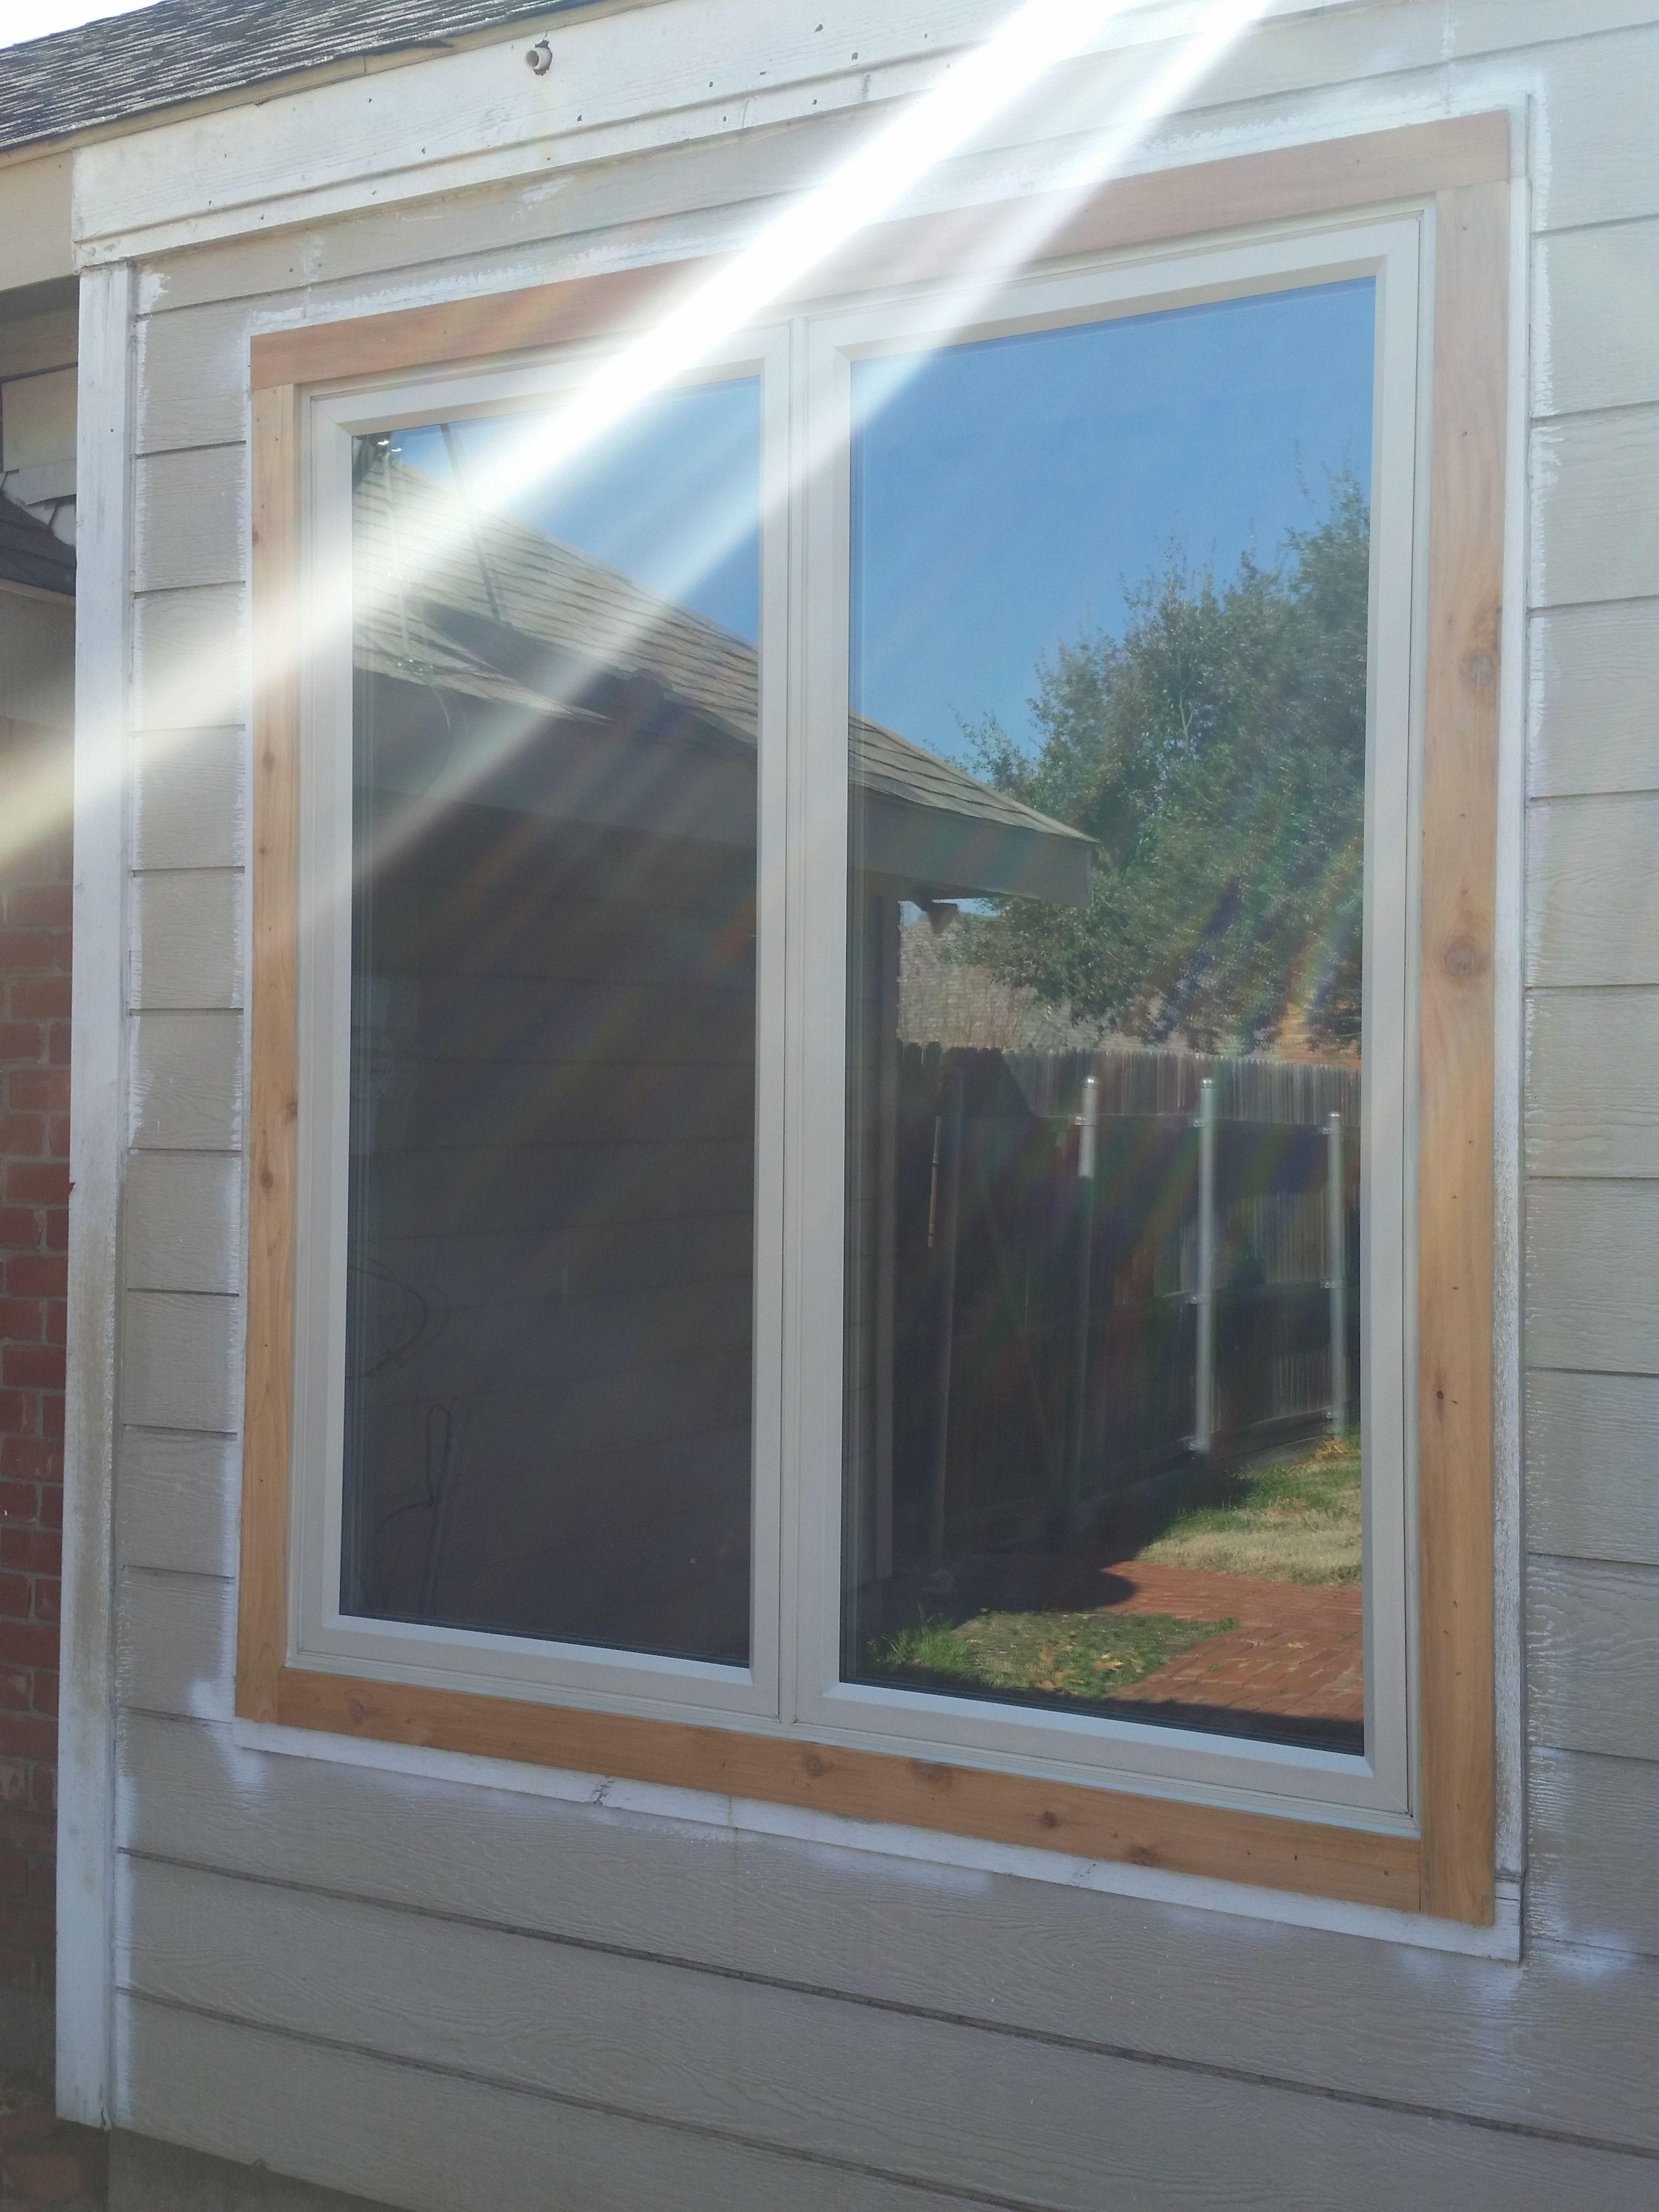 Twin Casement Windows With New Cedar Exterior Trim Vinyl Replacement Windows Pinterest